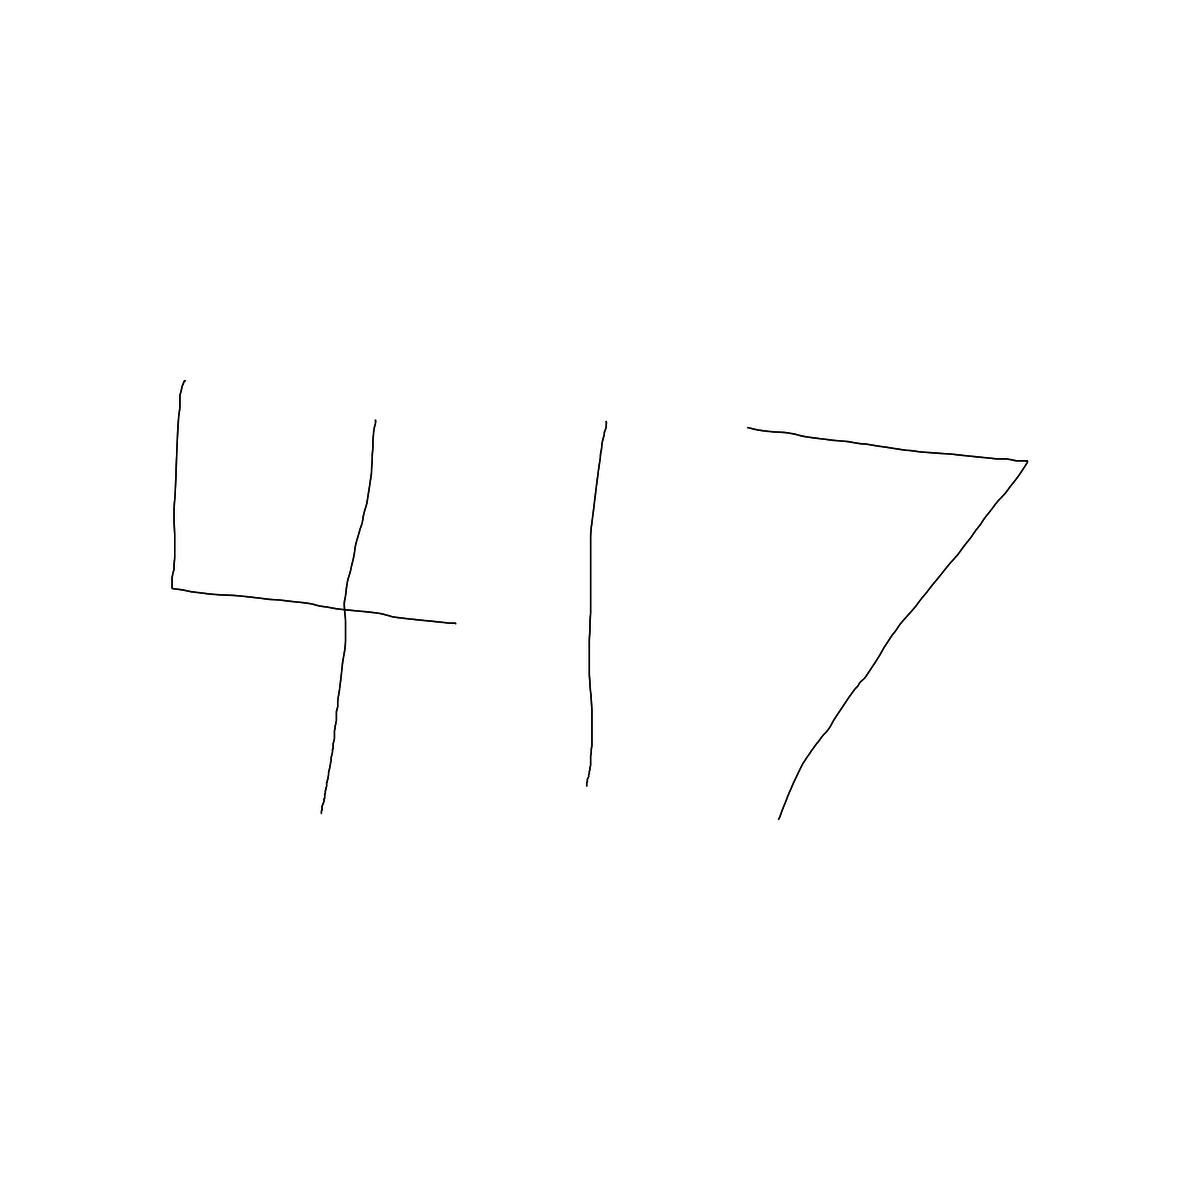 BAAAM drawing#7278 lat:32.8064041137695300lng: -97.2975997924804700